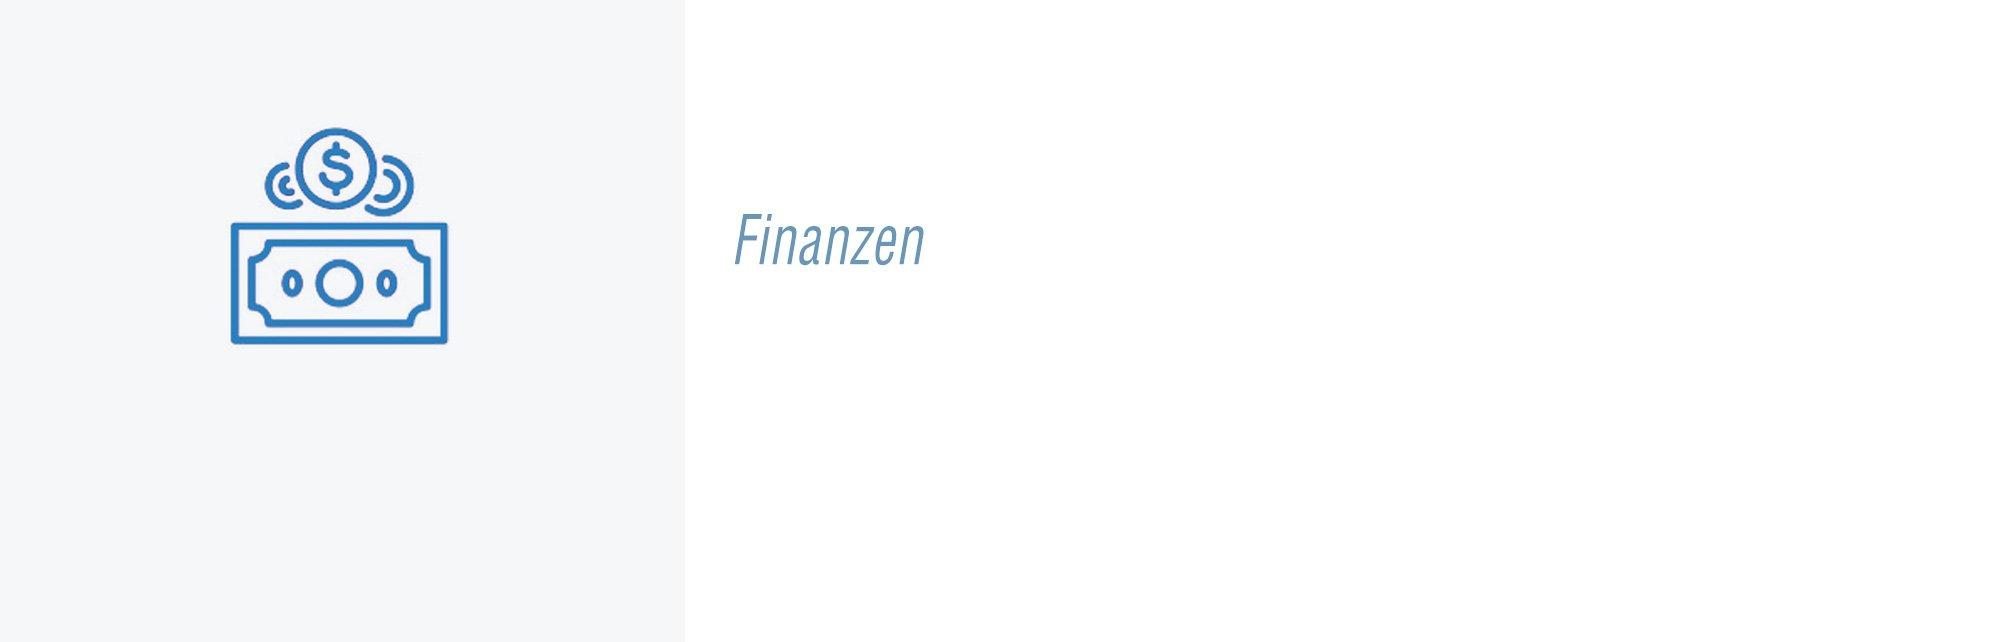 Finanzen genossenschaft berlin